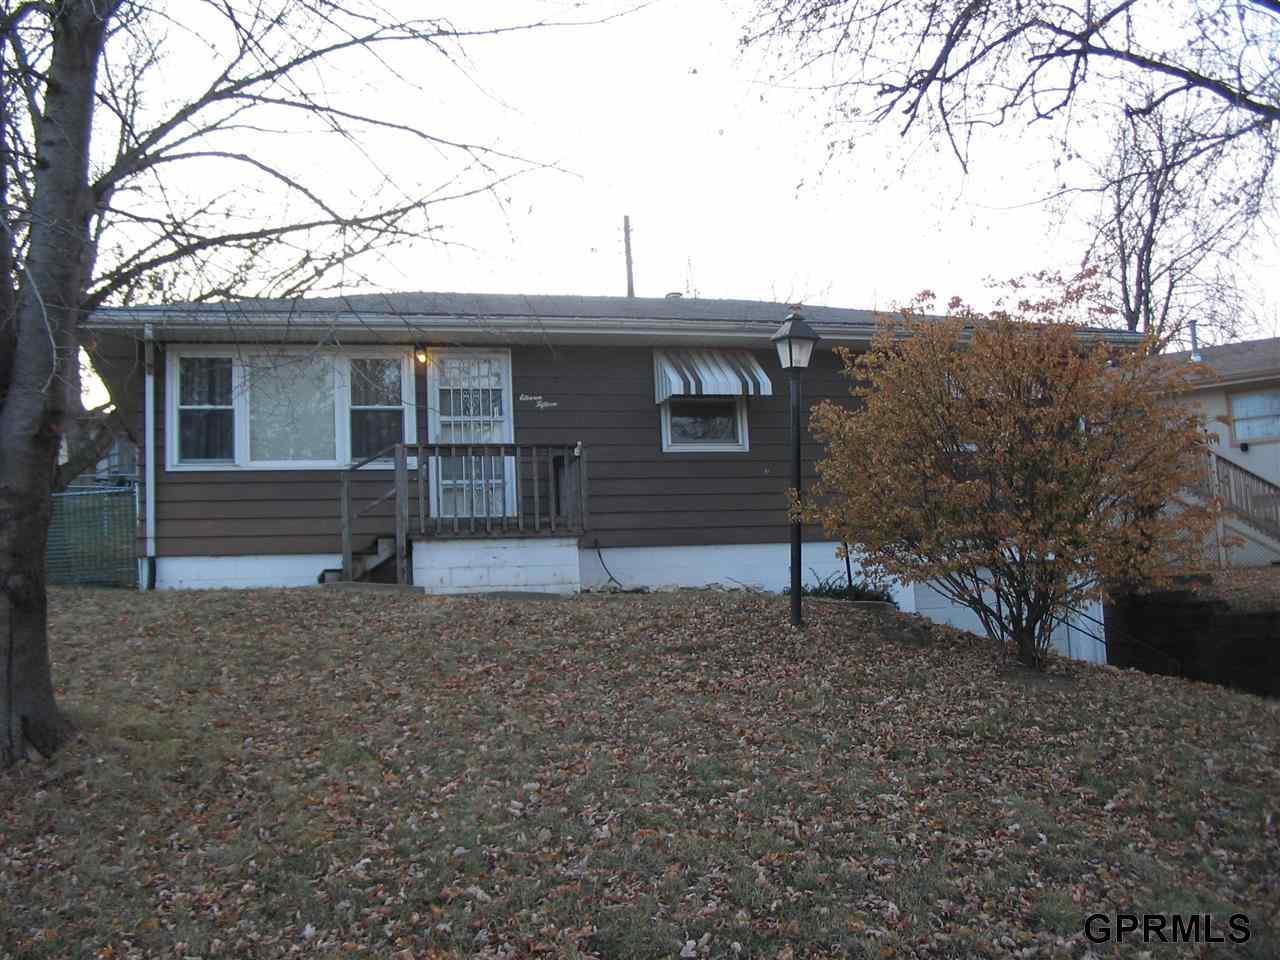 Rental Homes for Rent, ListingId:30685049, location: 1115 Scott St Plattsmouth 68048